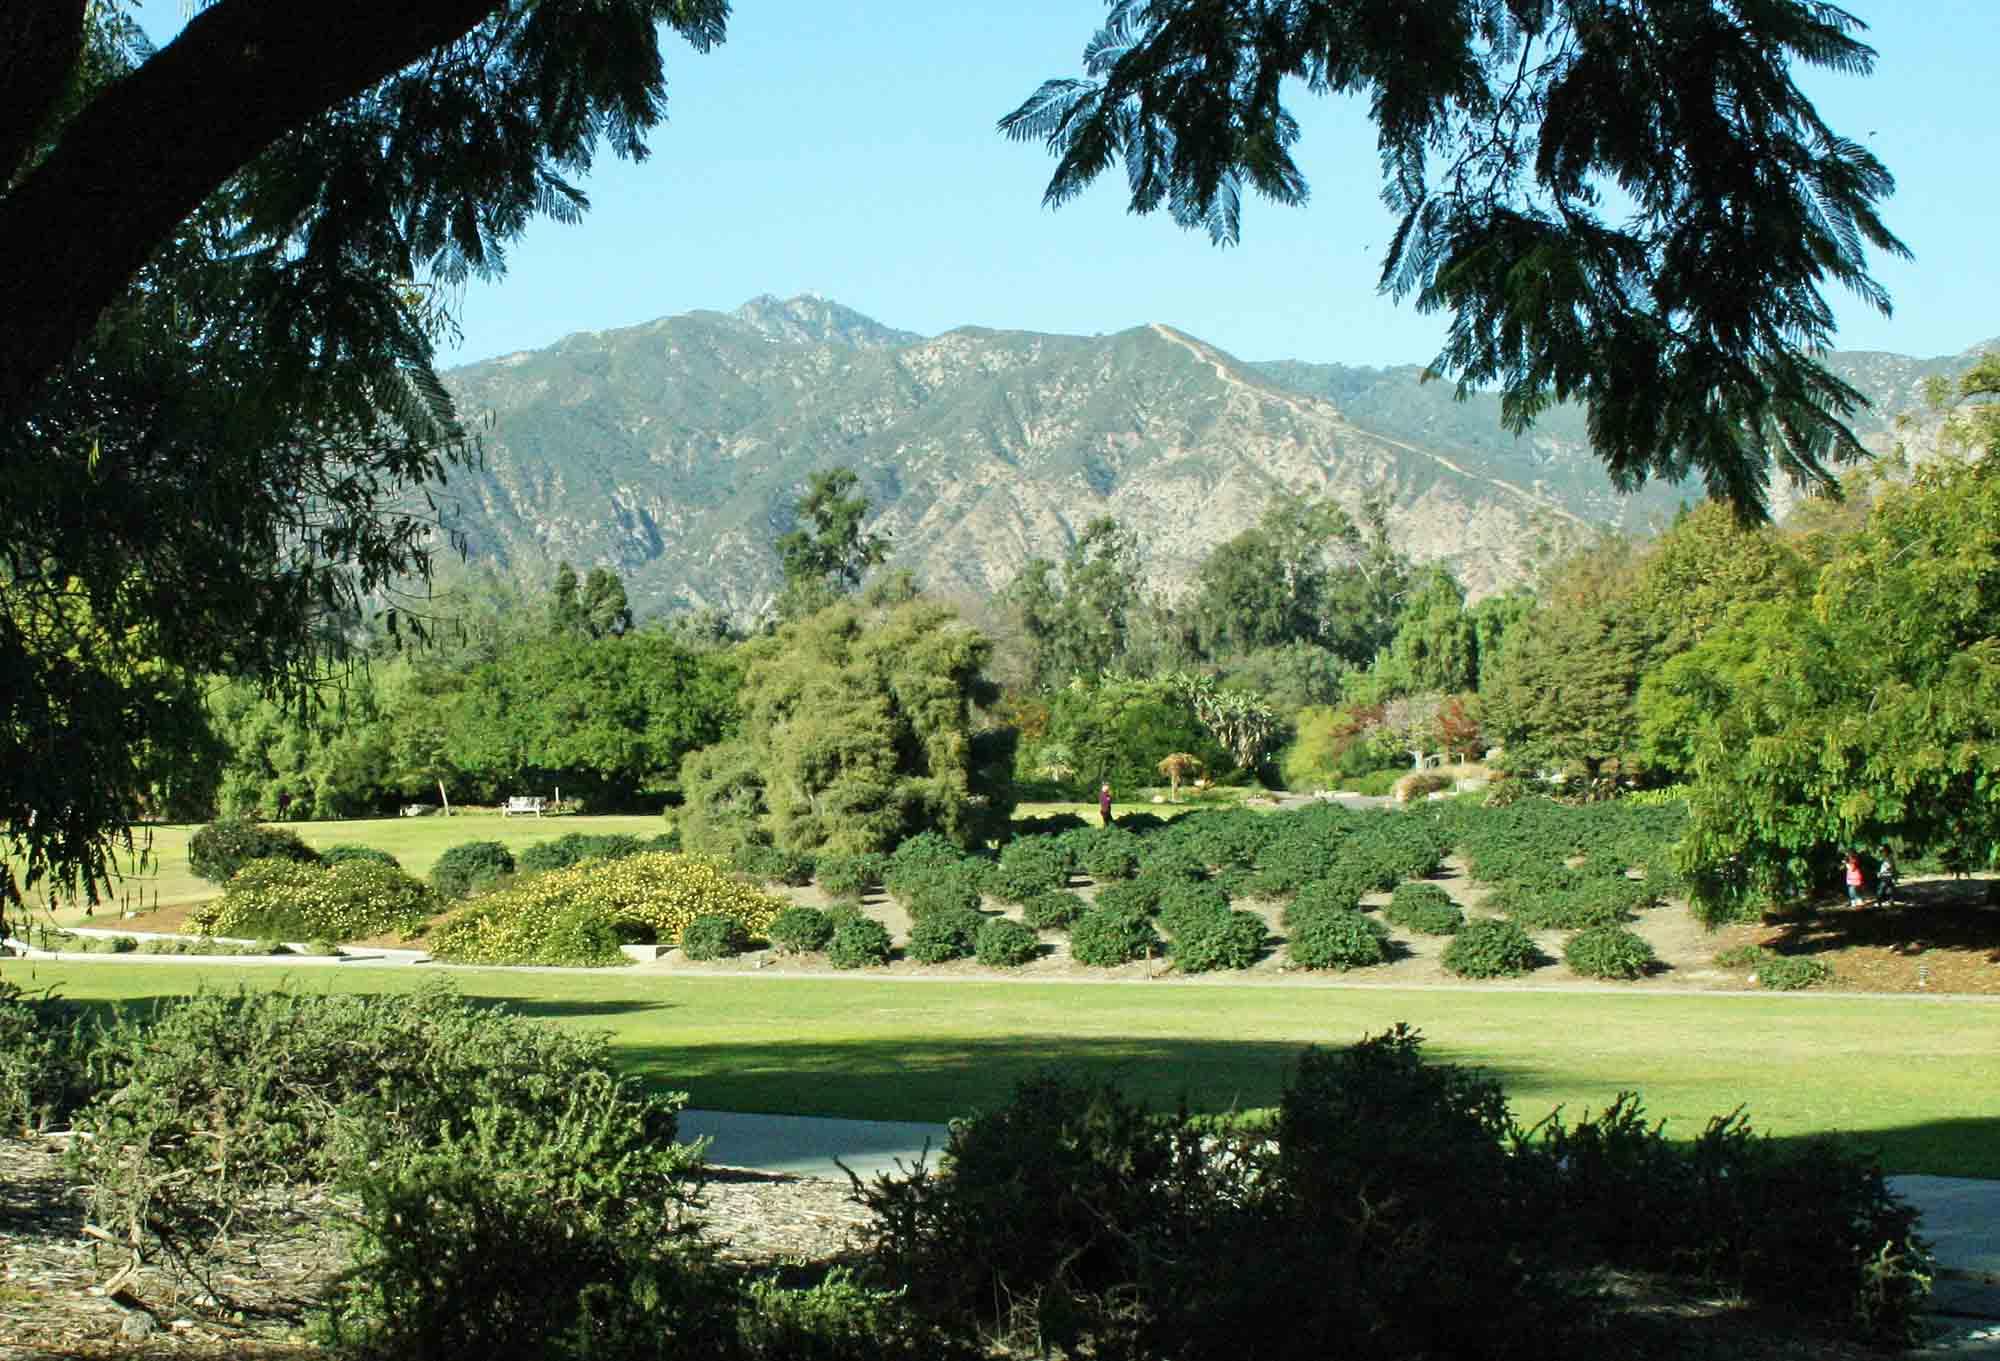 Botanical Gardens Los Angeles Los Angeles Arboretum Botanical Gardens The Huntington Library